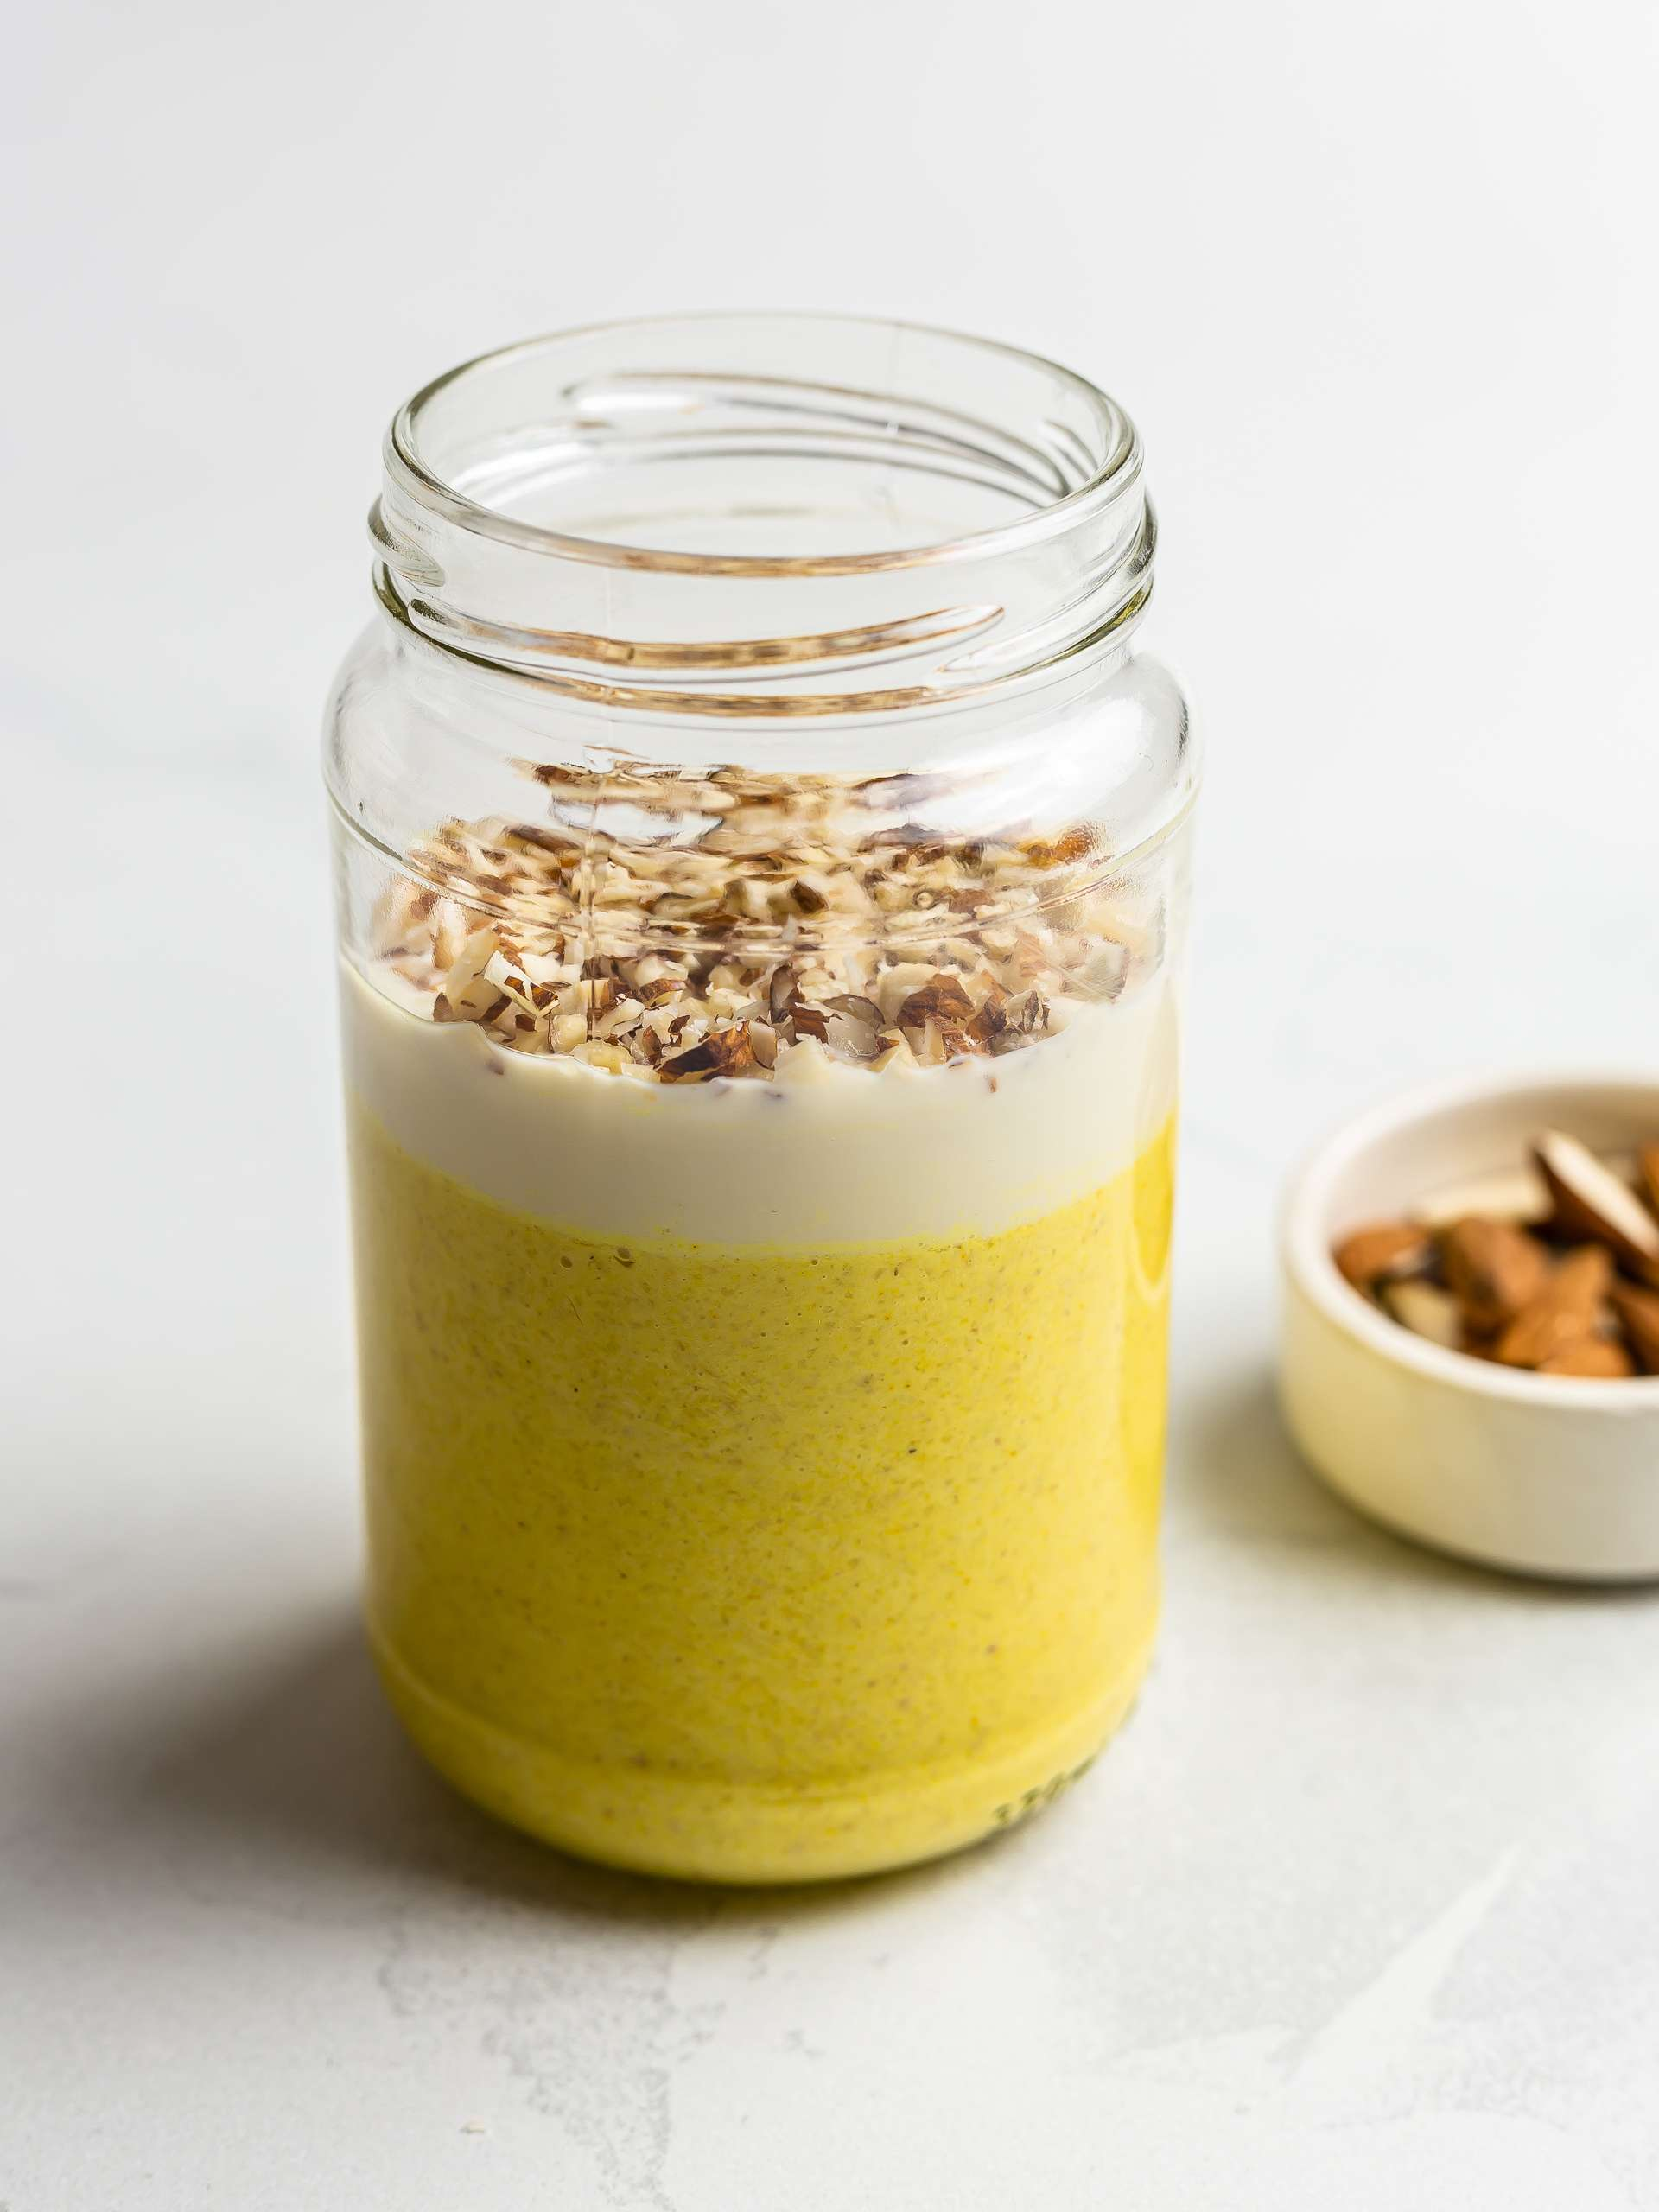 mango lassi oats in a jar with chopped almonds